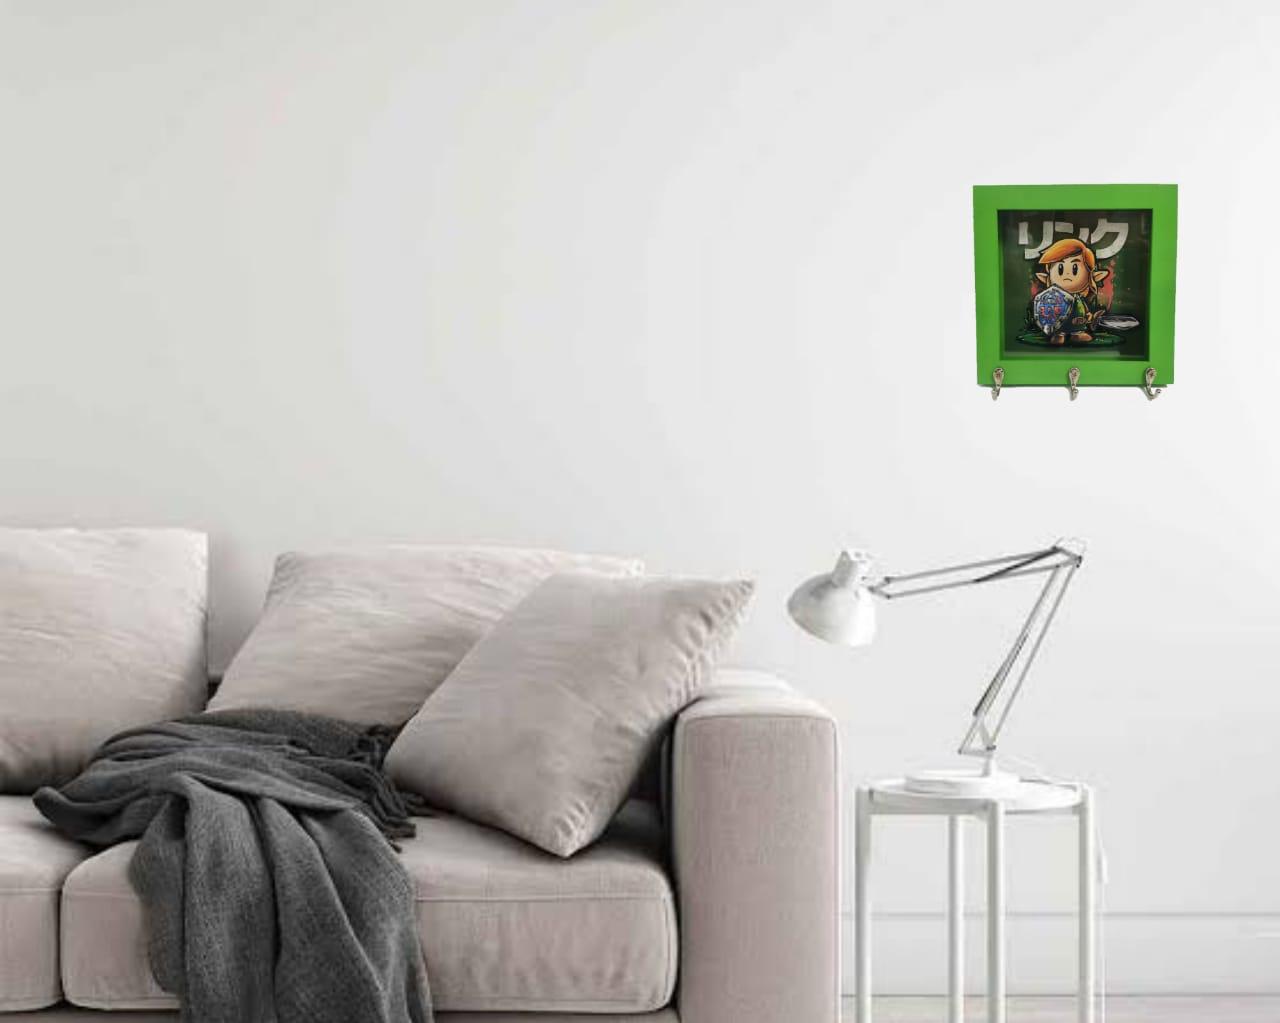 Quadro Porta Chave Decorativo 3D Link's Awakening